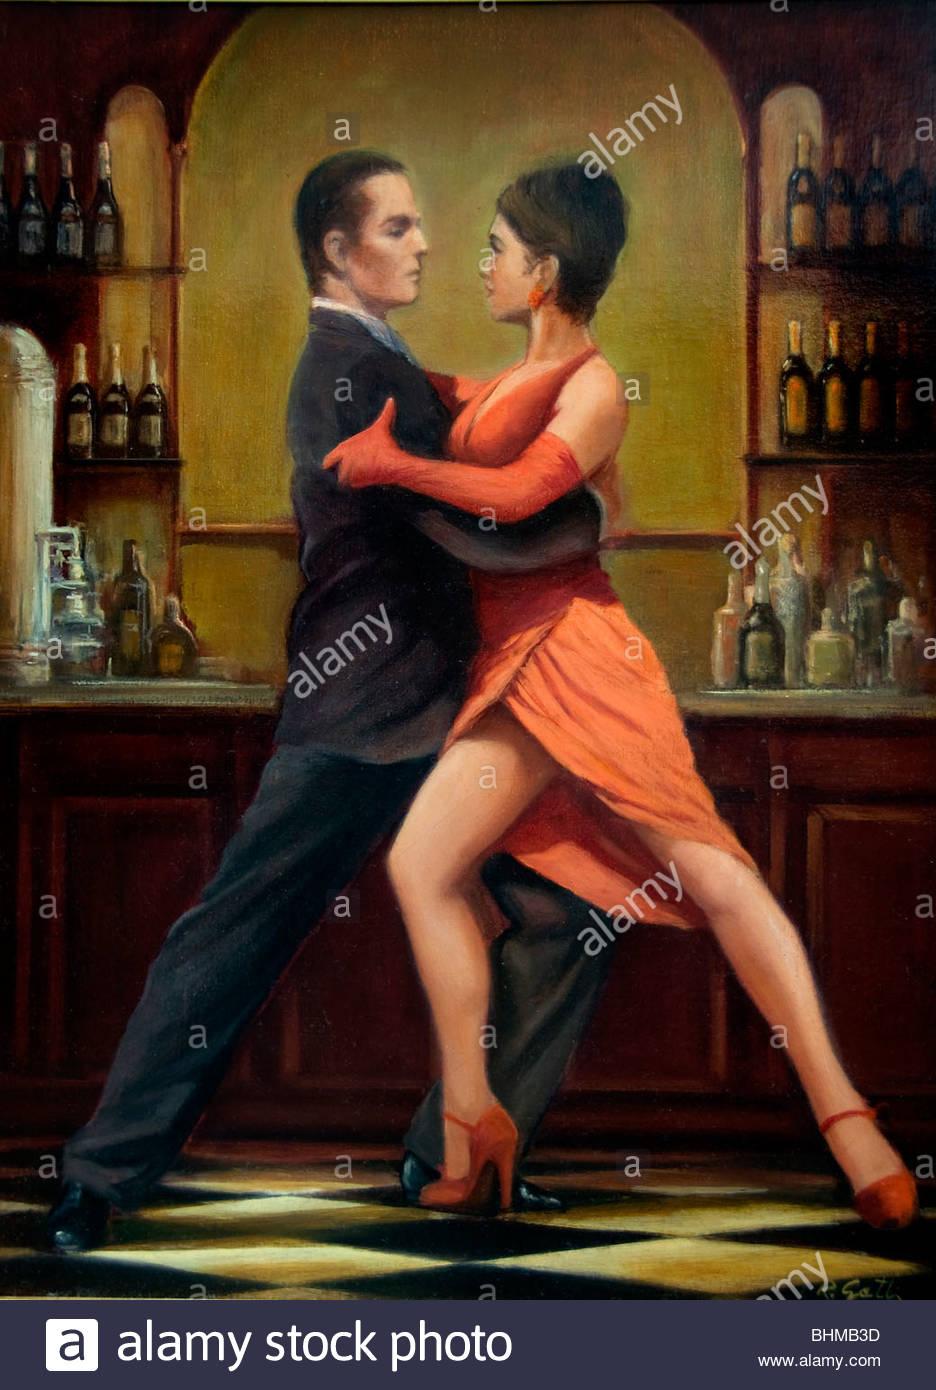 Tango Buenos Aires Argentina La Boca El Caminito segno Street Painting Immagini Stock